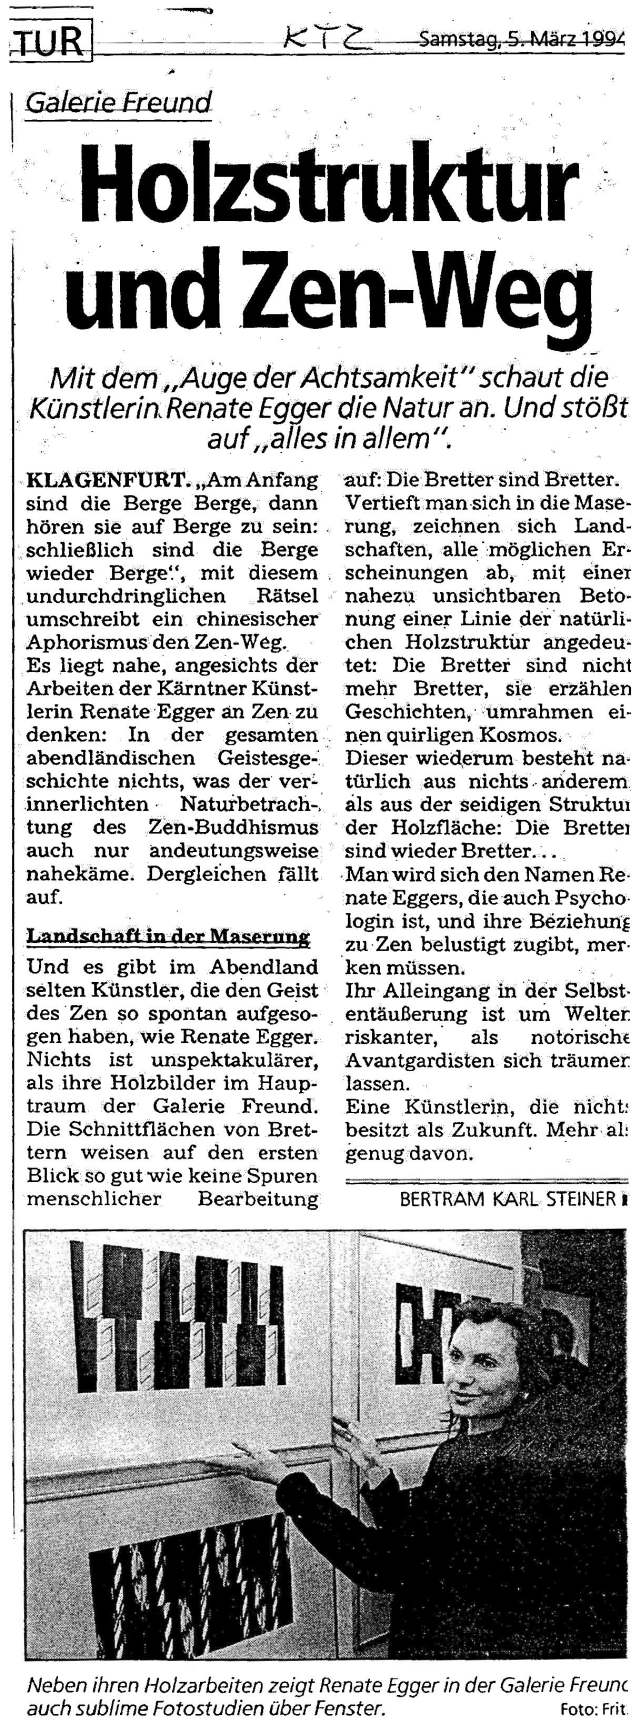 Renate Egger- Bertram Karl Steiner